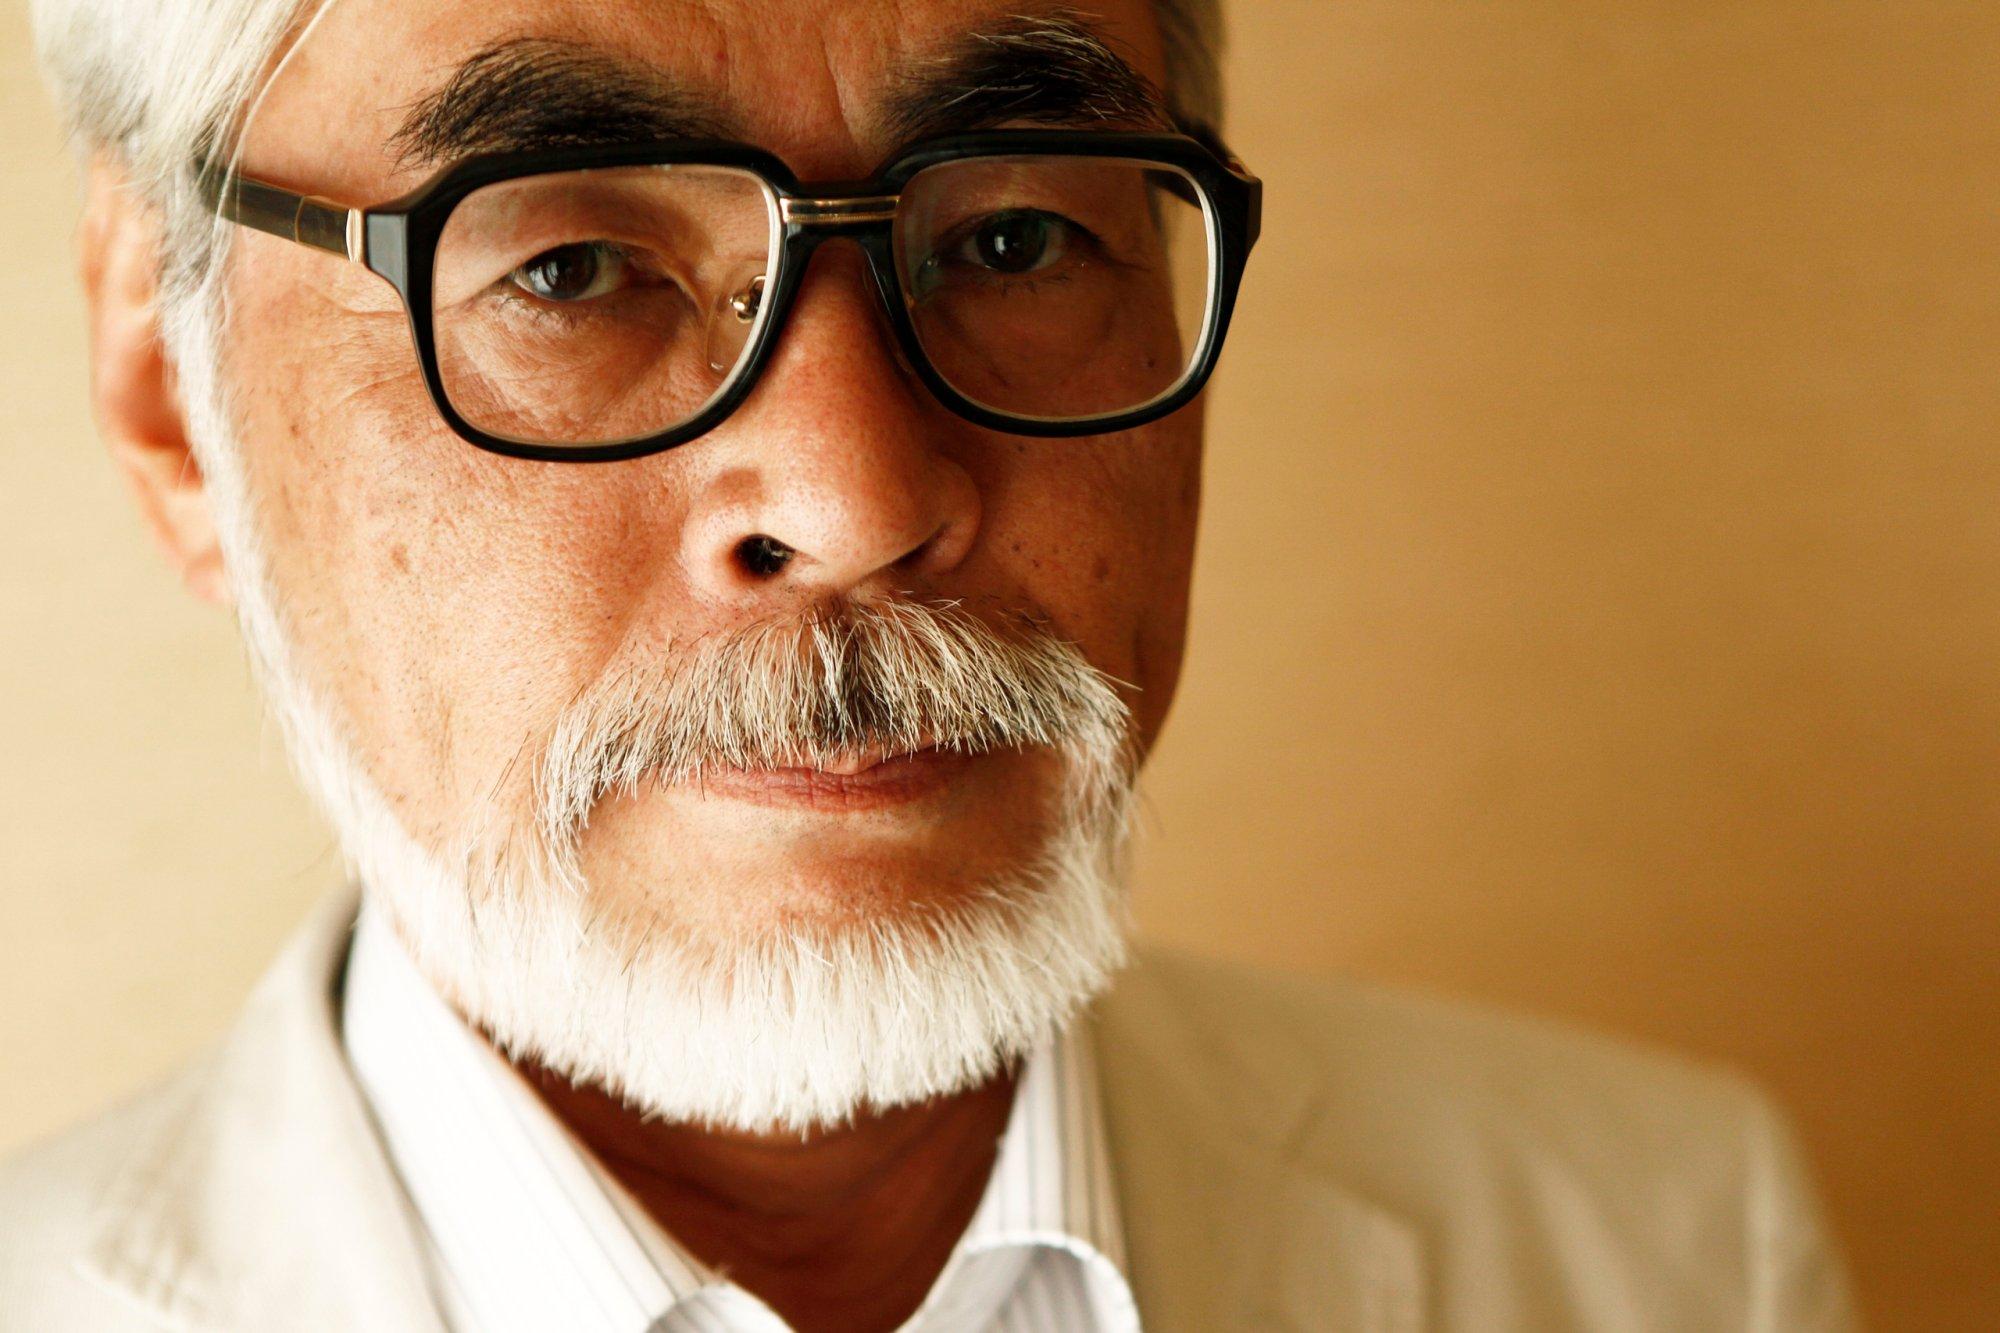 Hayao Miyazaki High Quality Background on Wallpapers Vista